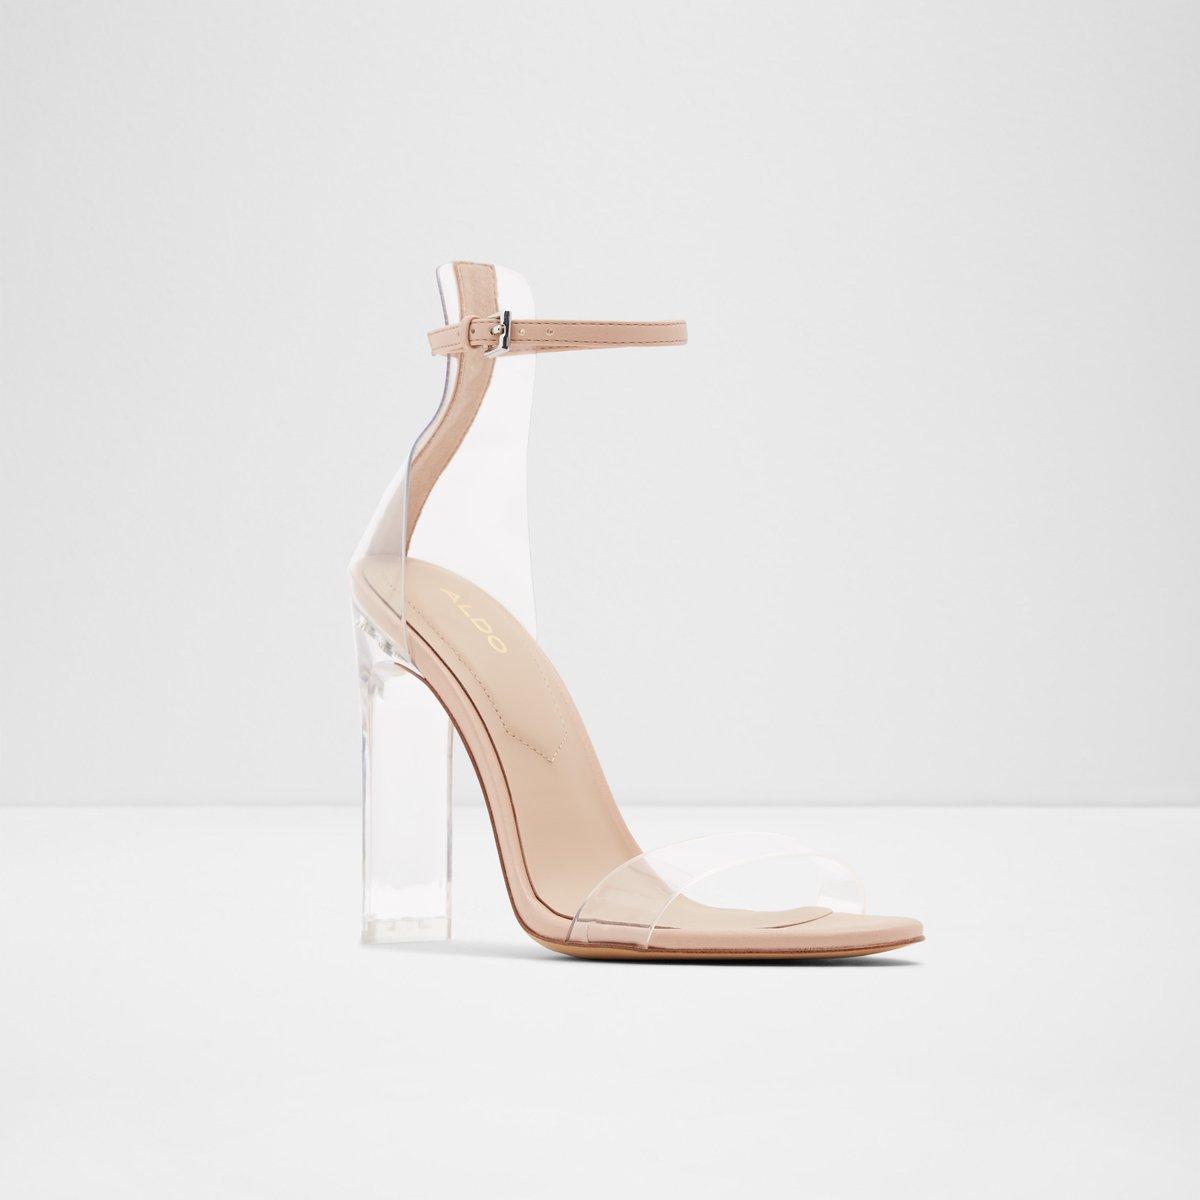 Aserania Bone Women's Open-toe heels